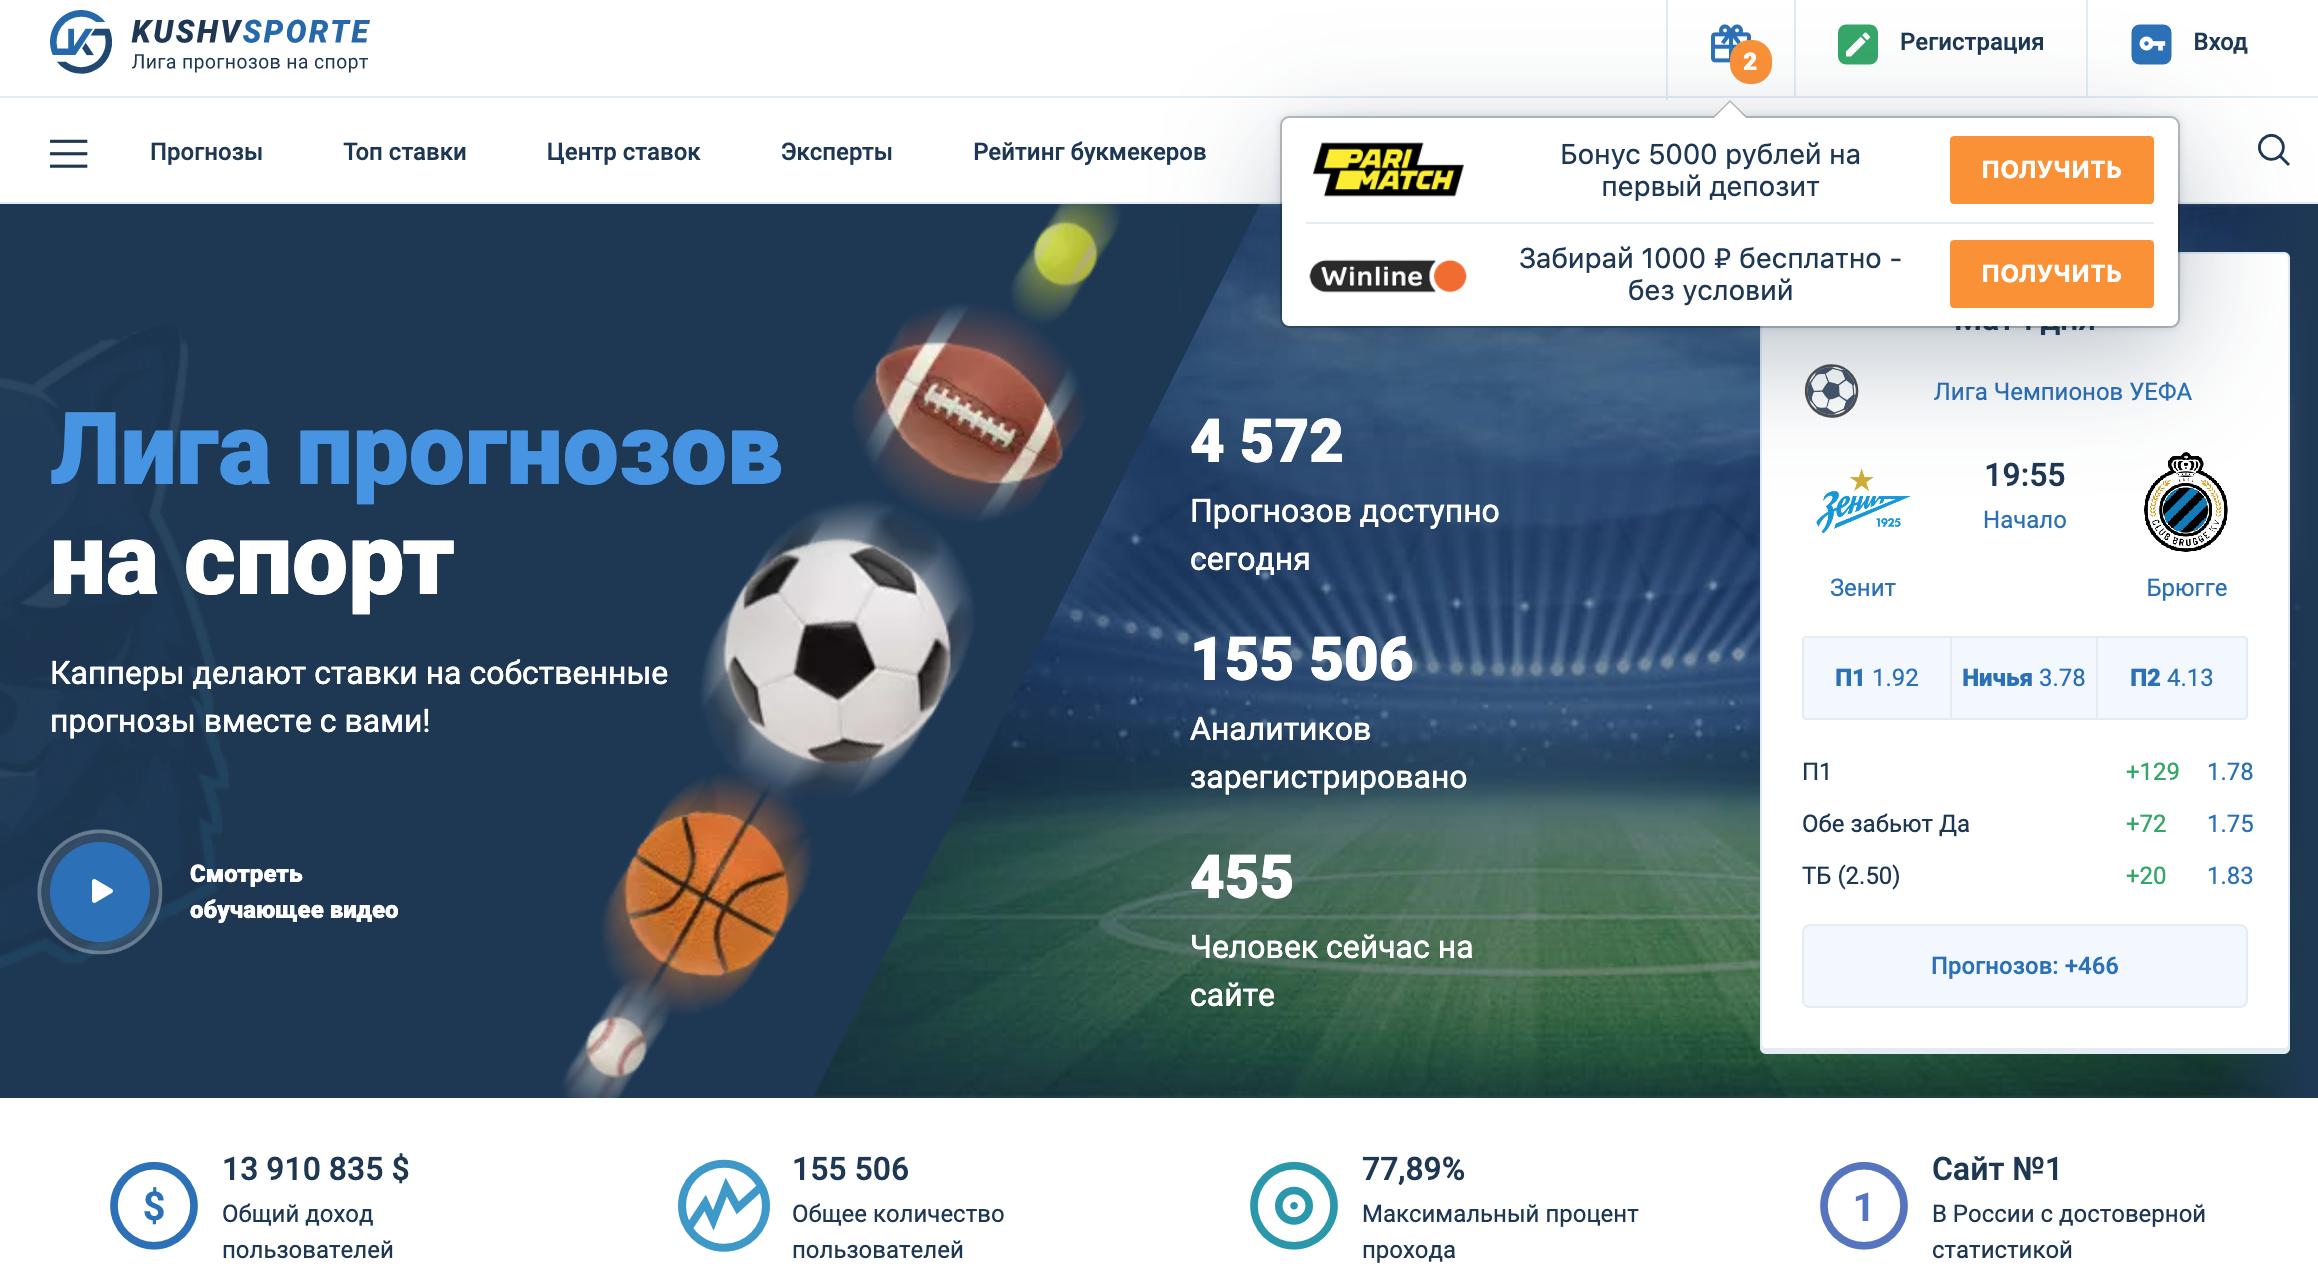 Главная страница сайта Kushvsporte ru (Кушвспорте ру)